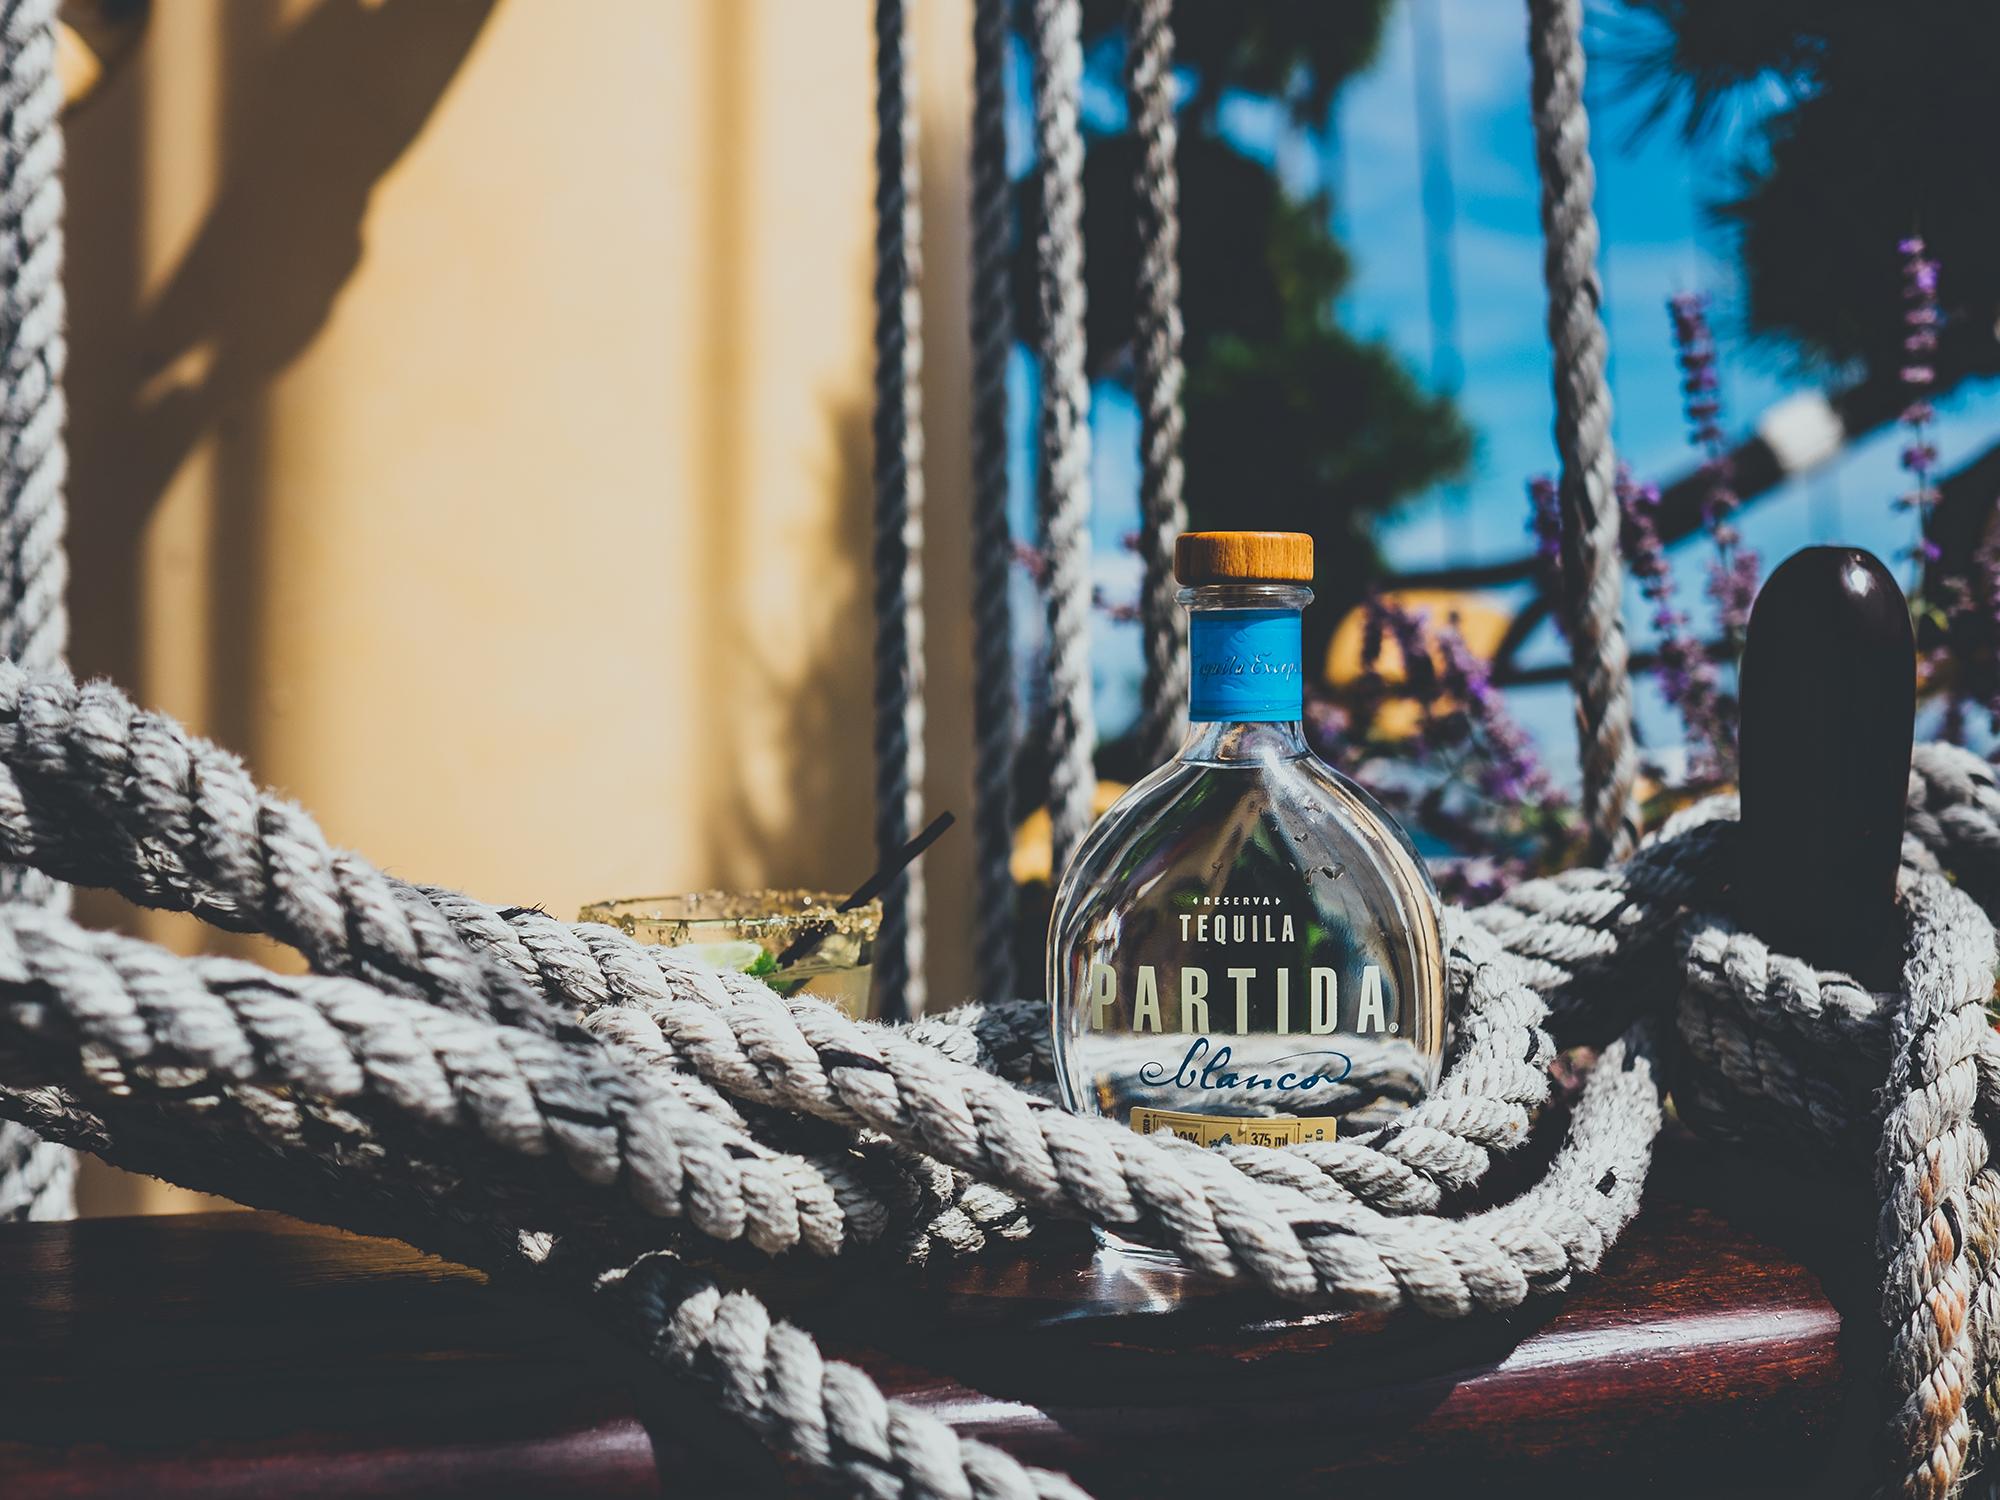 Tequila-Partida-5.jpg